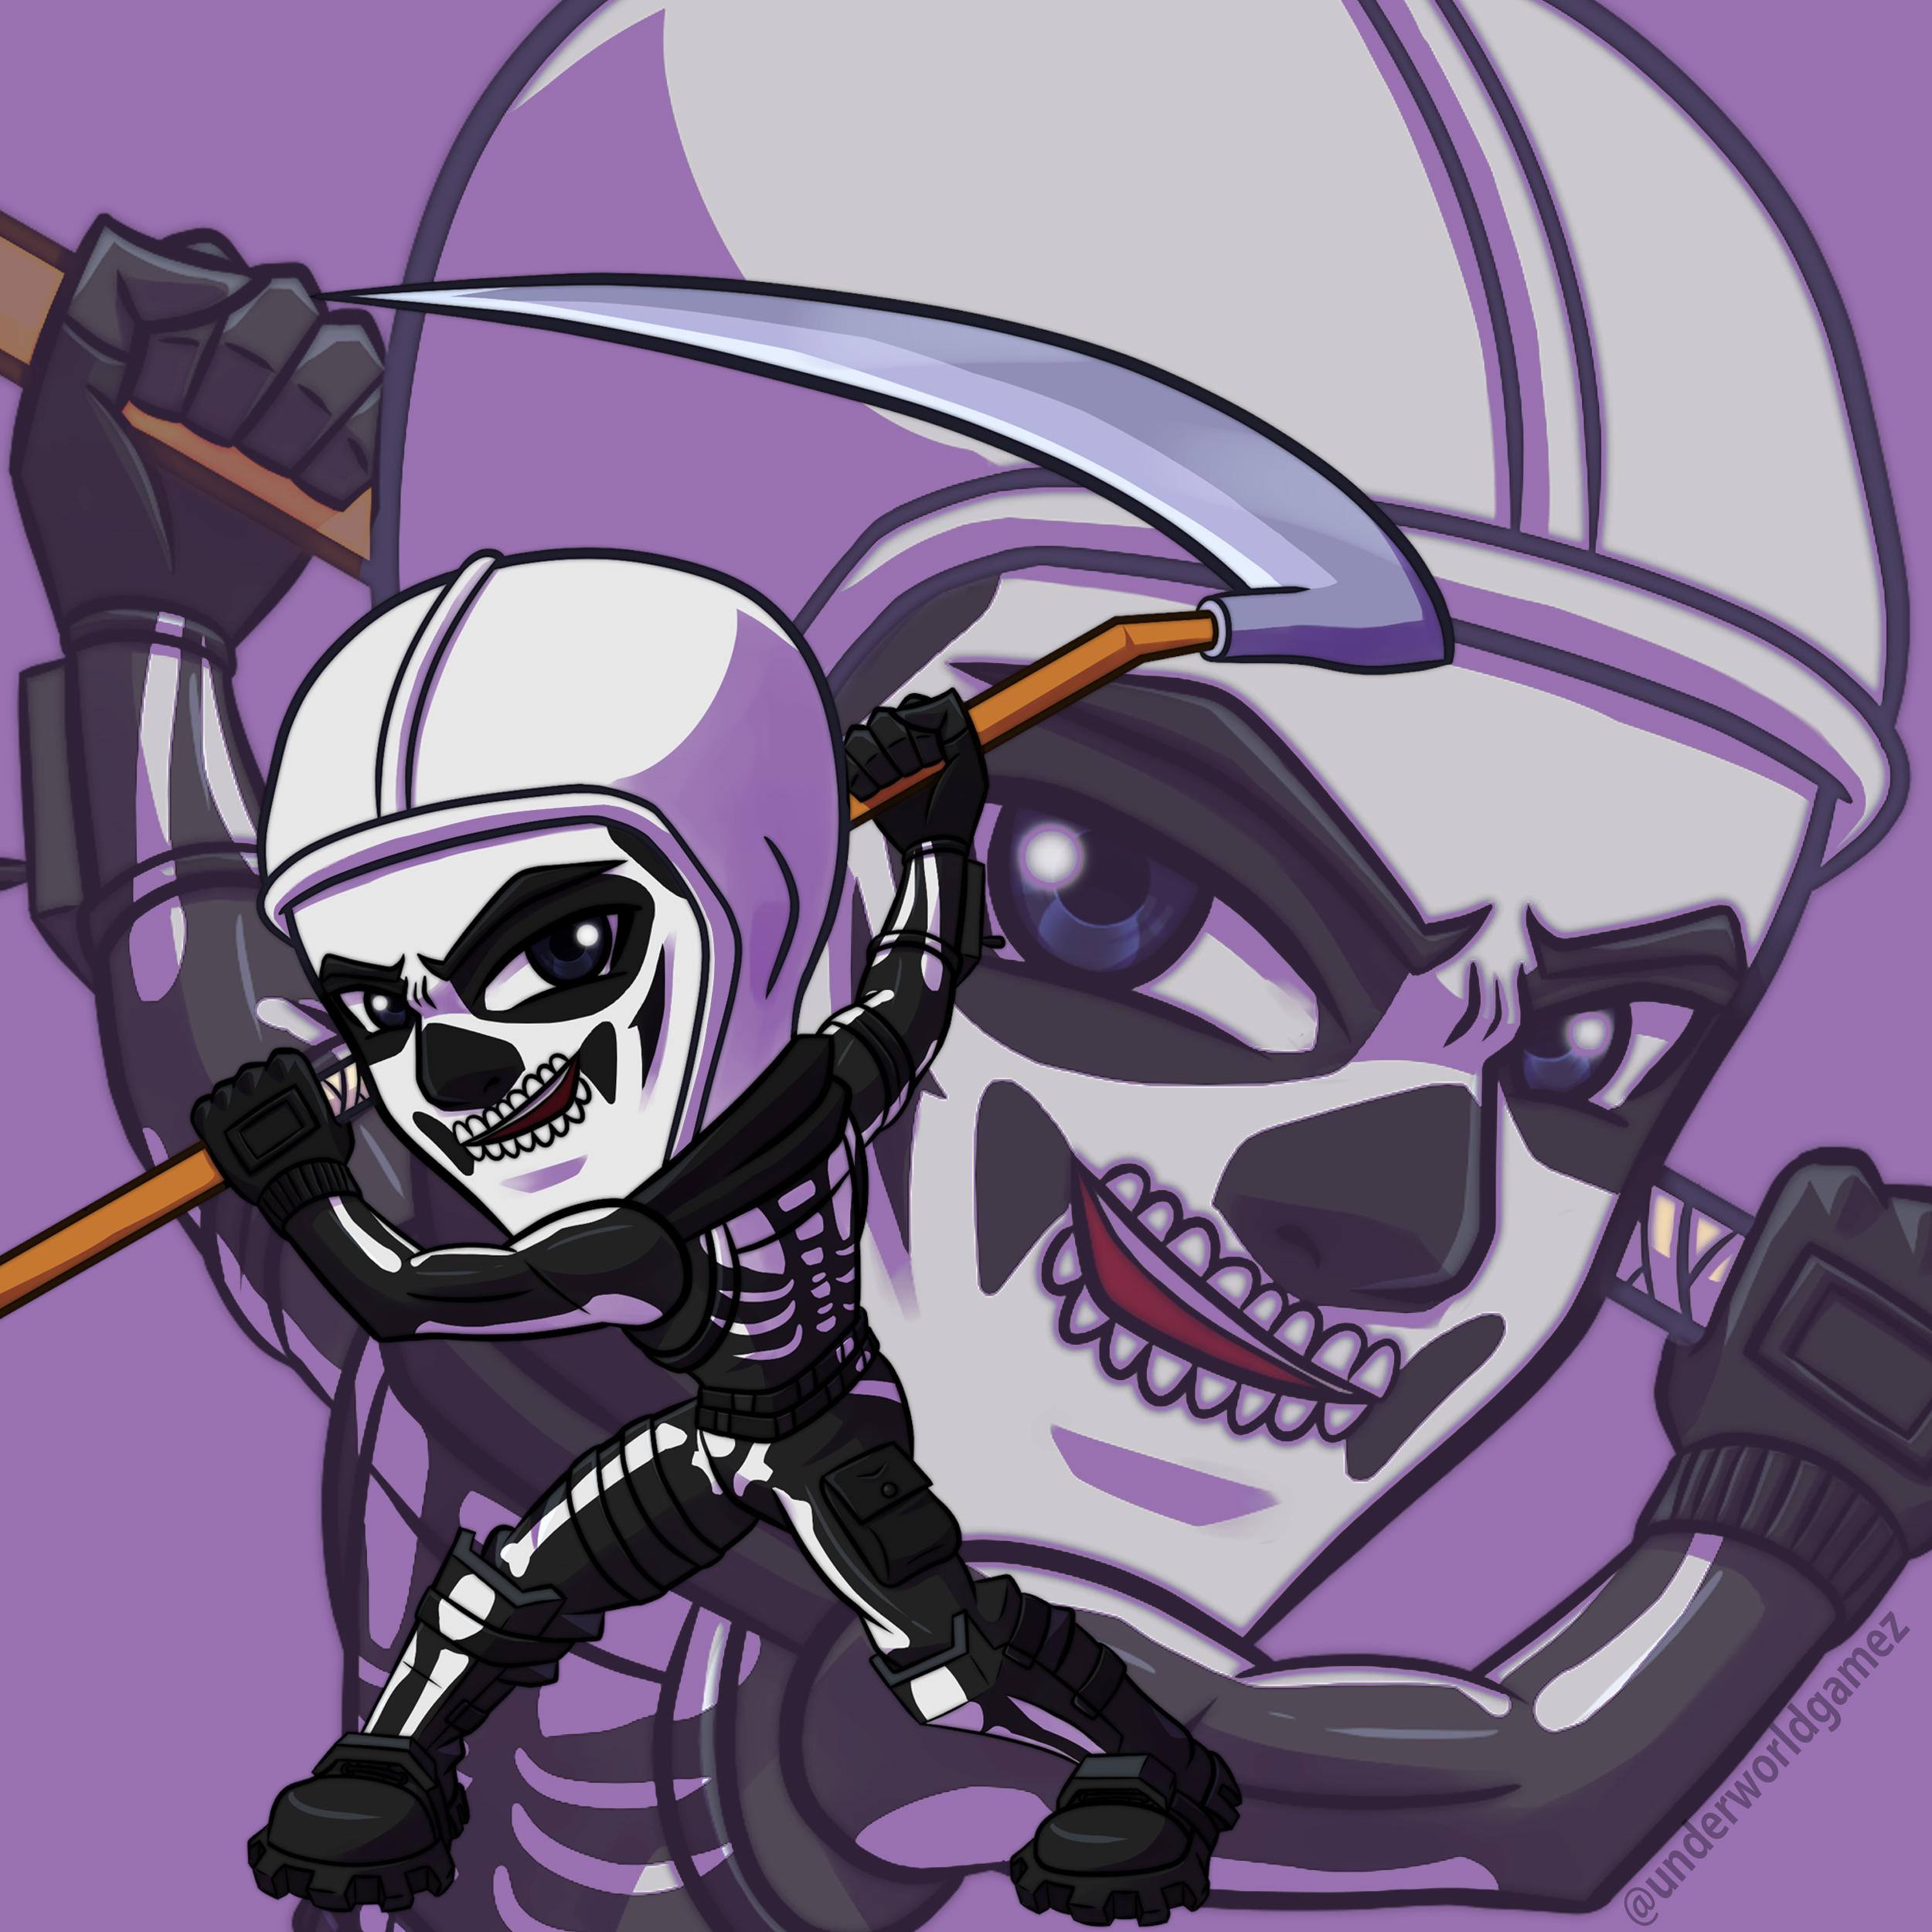 Skull trooper Fortnite 8x8 portrait — Underworld Gamez